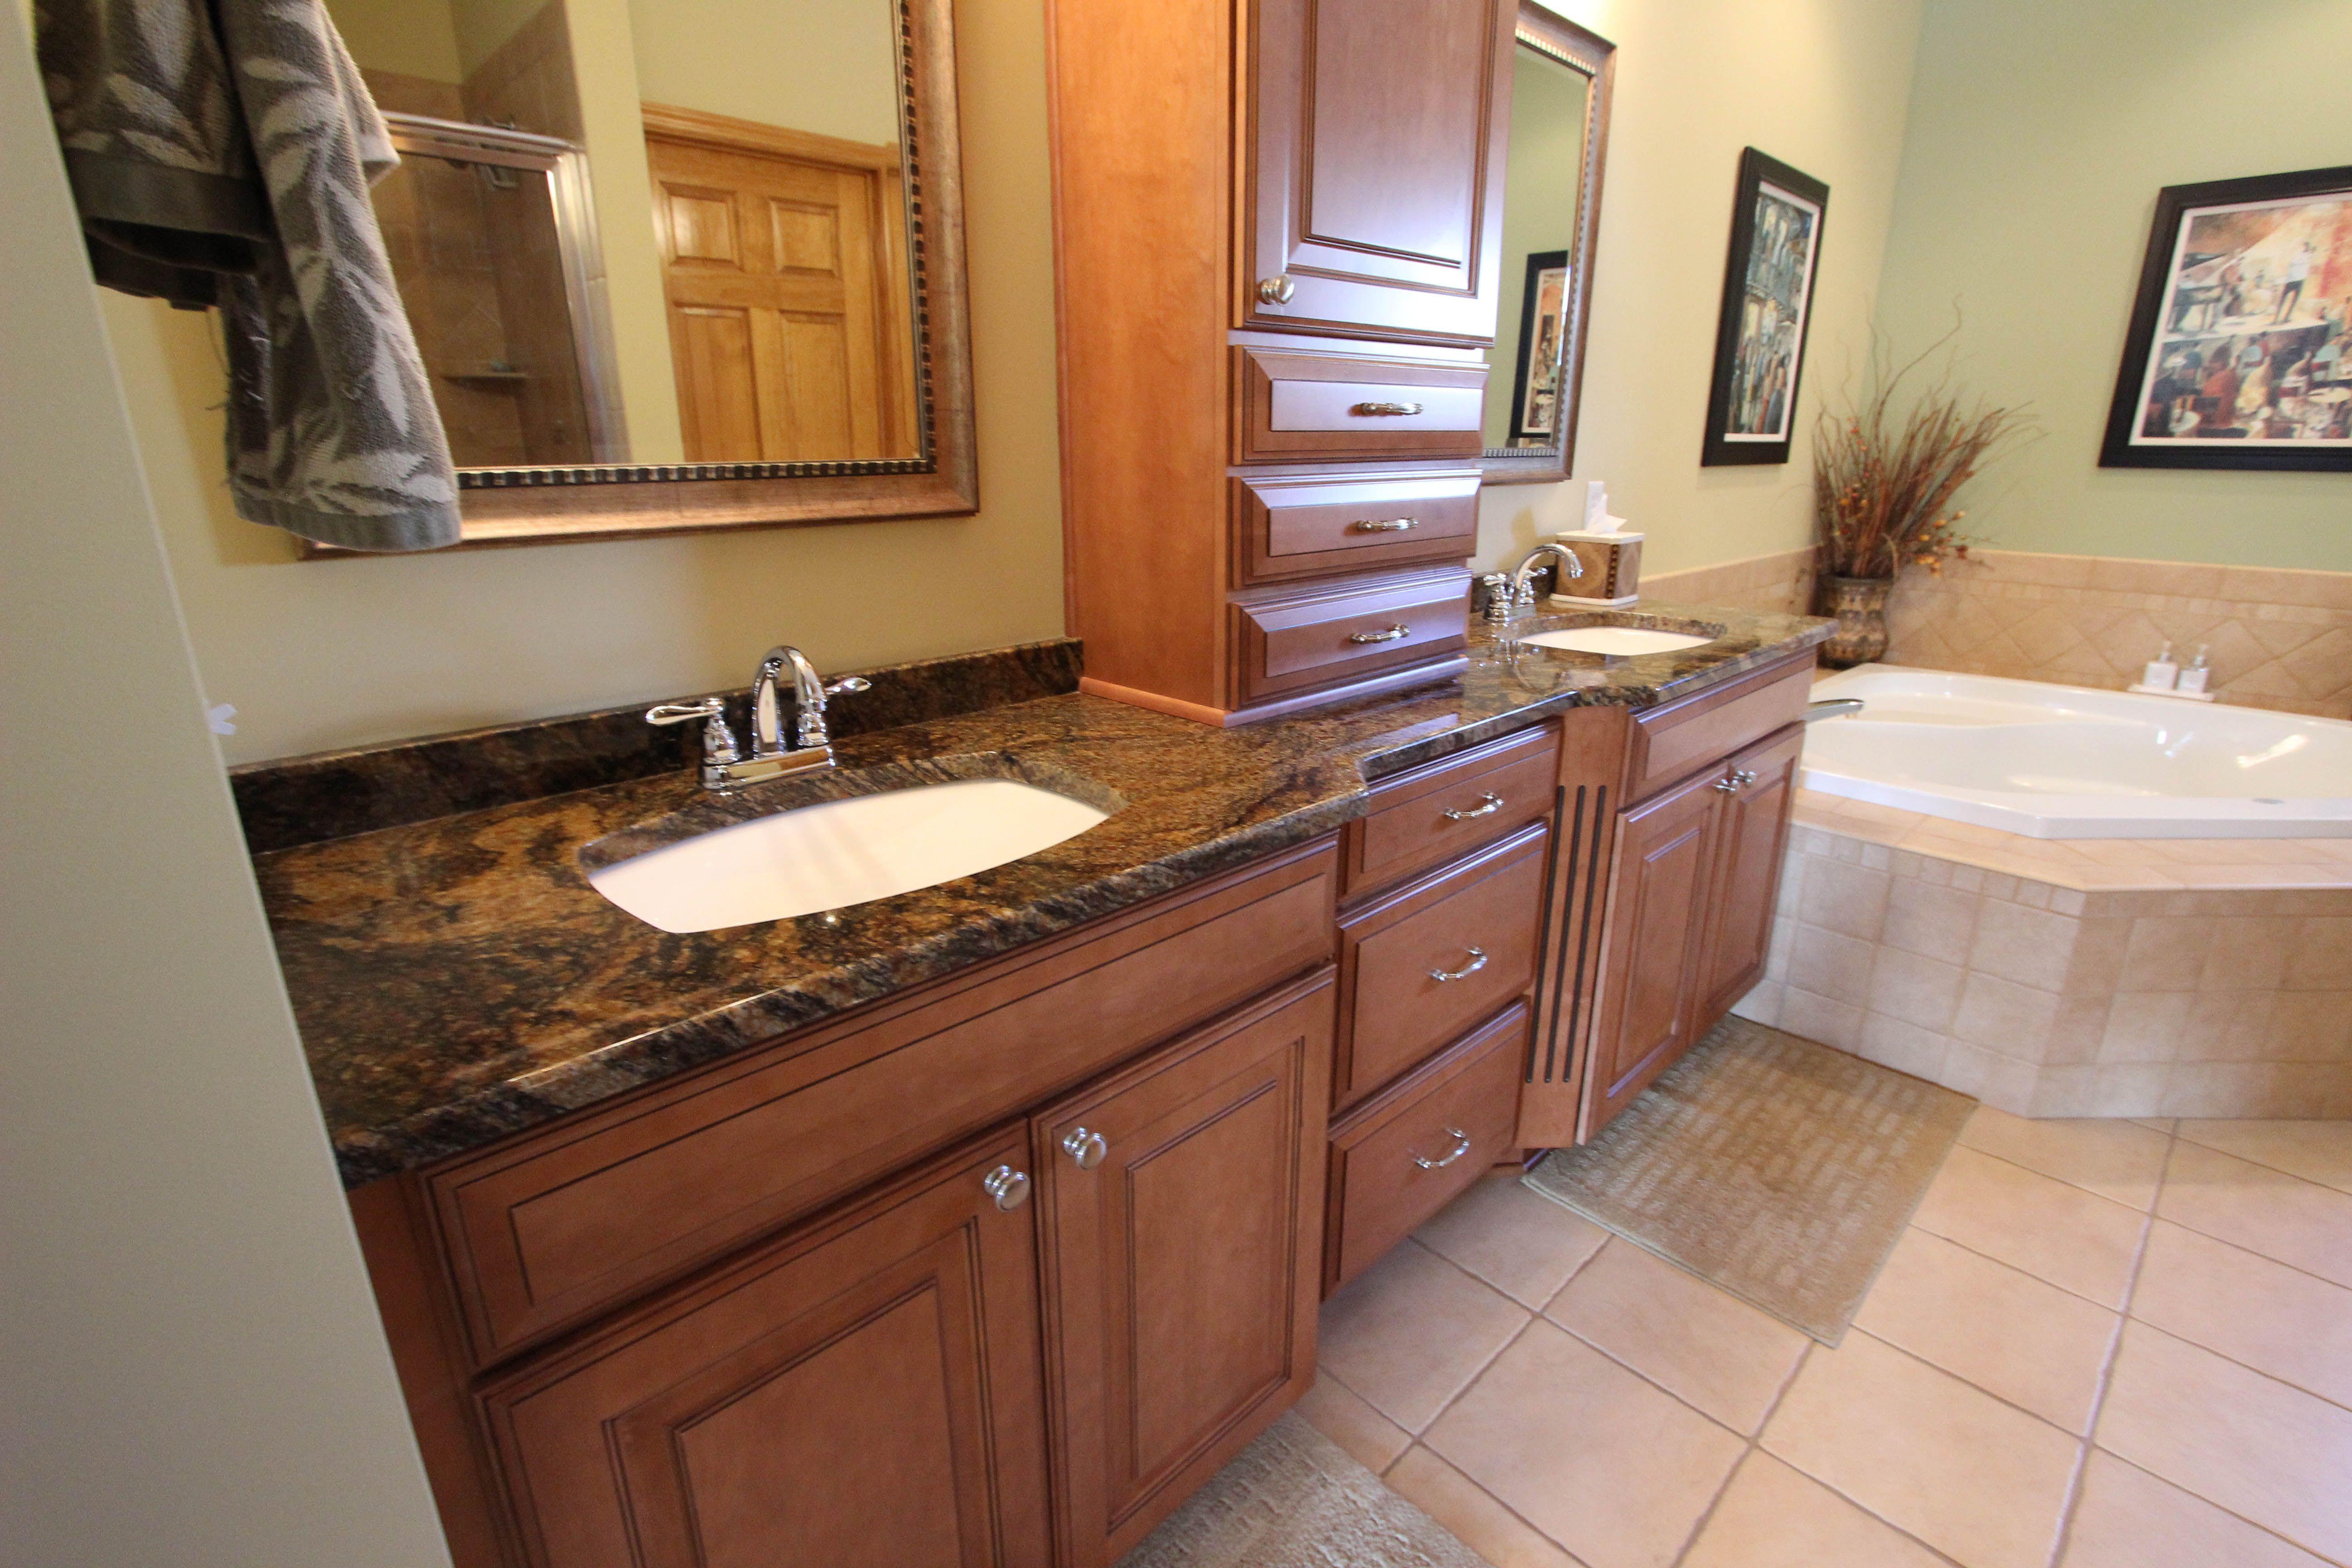 Double Sink Vanity With Tigers Eye Colored Granite Countertop